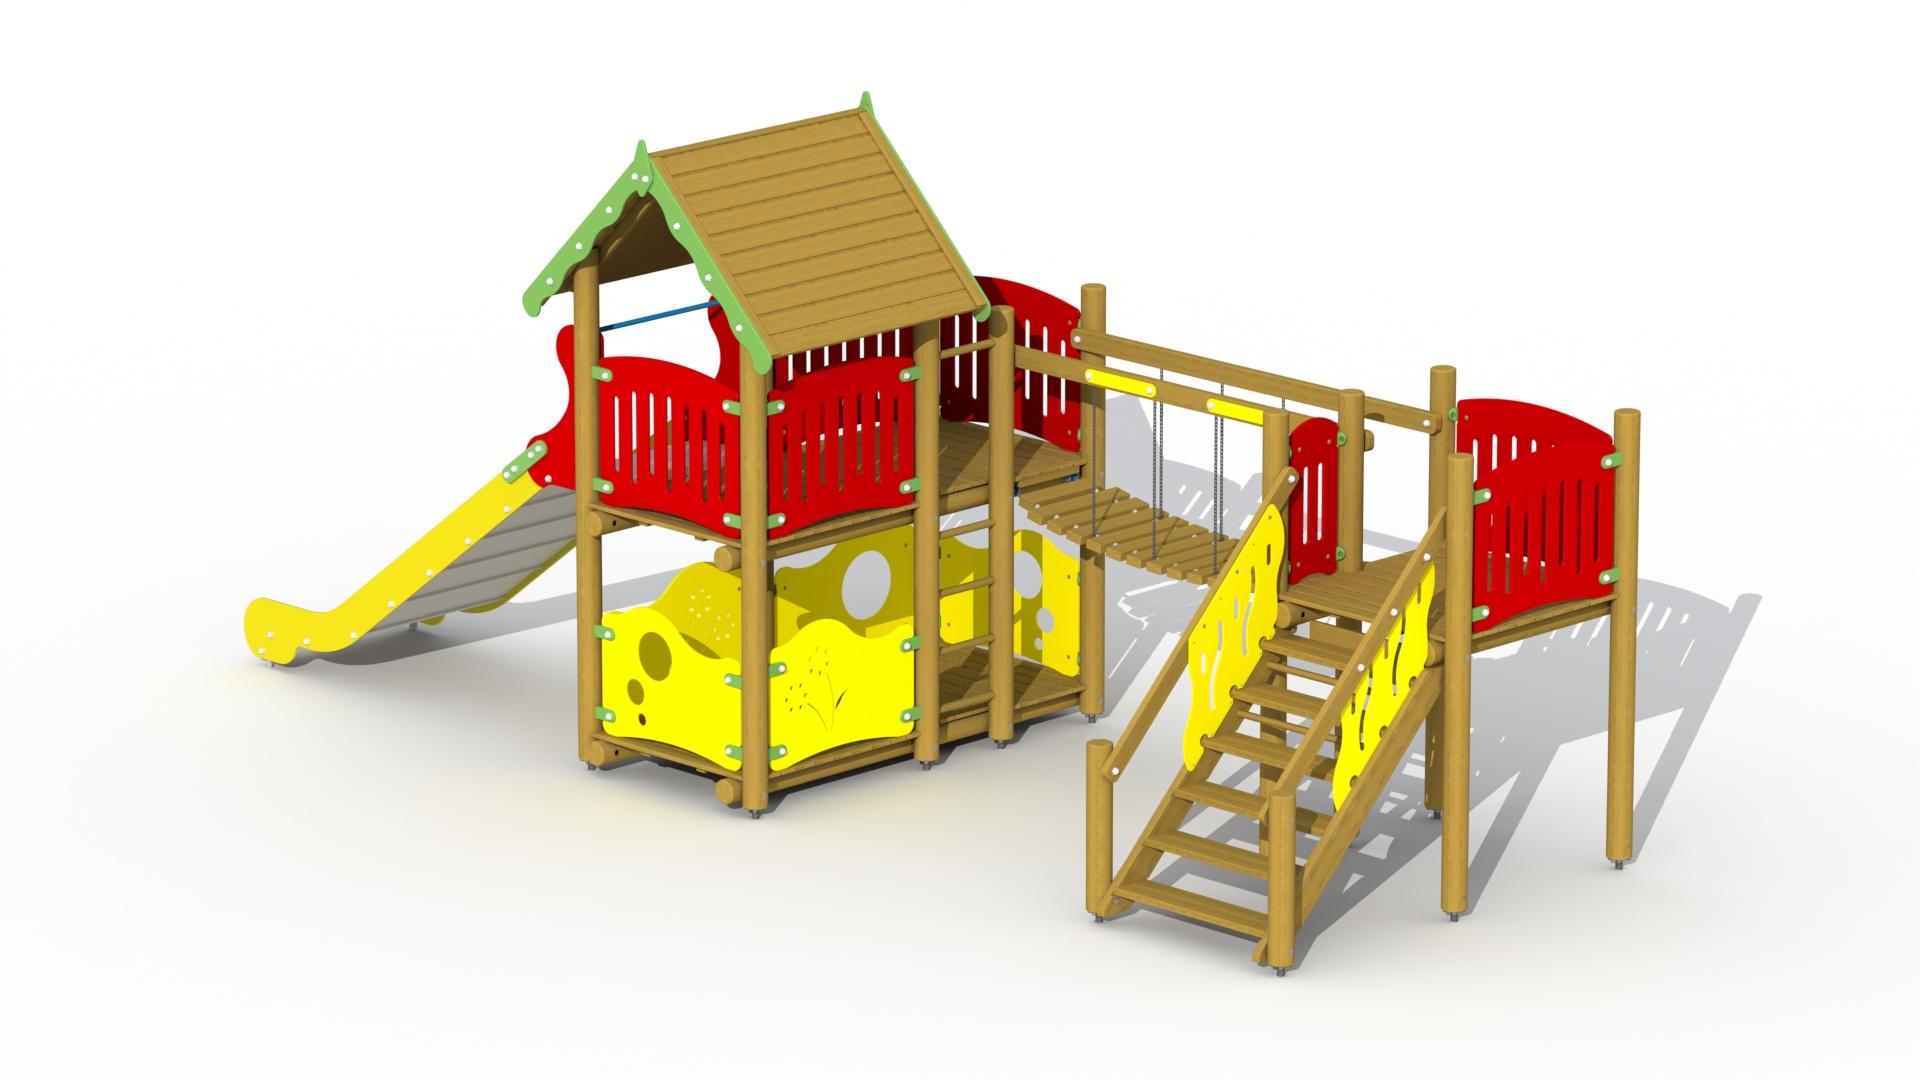 Fortress (stainless Steel Slide 1 M, Footbridge)